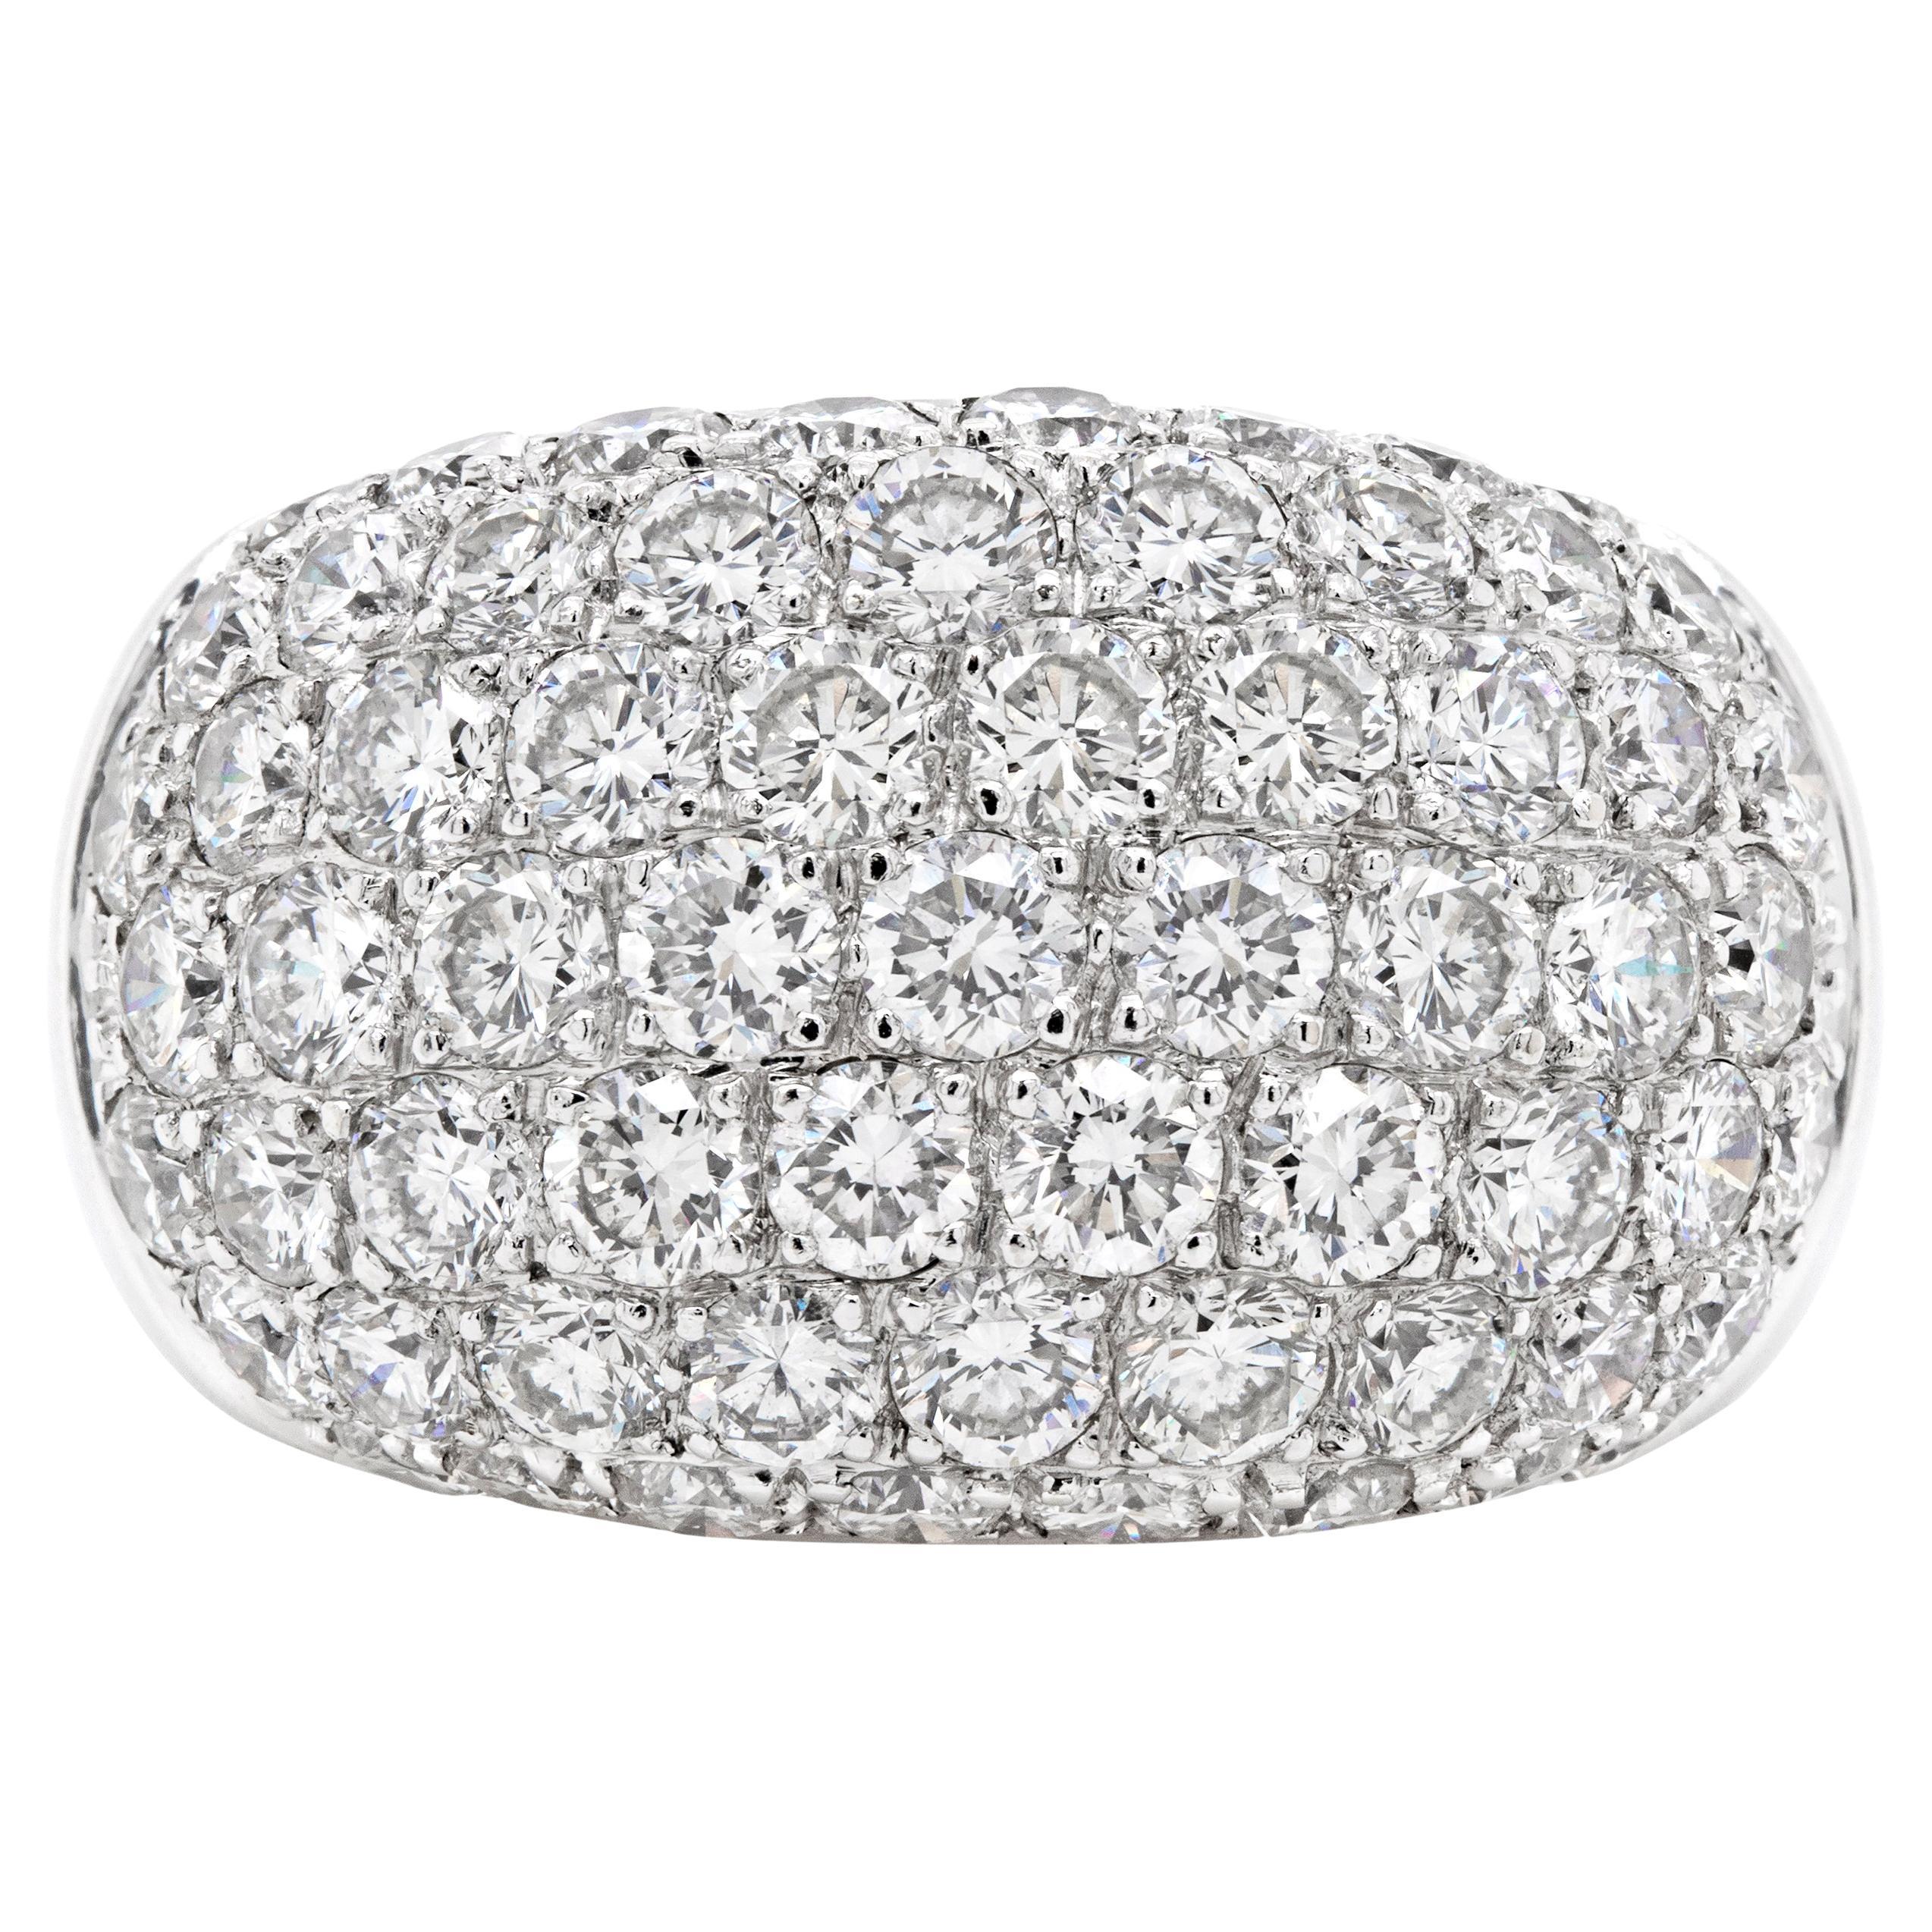 Diamond 18 Carat White Gold Bombé Cluster Dome Cocktail Ring